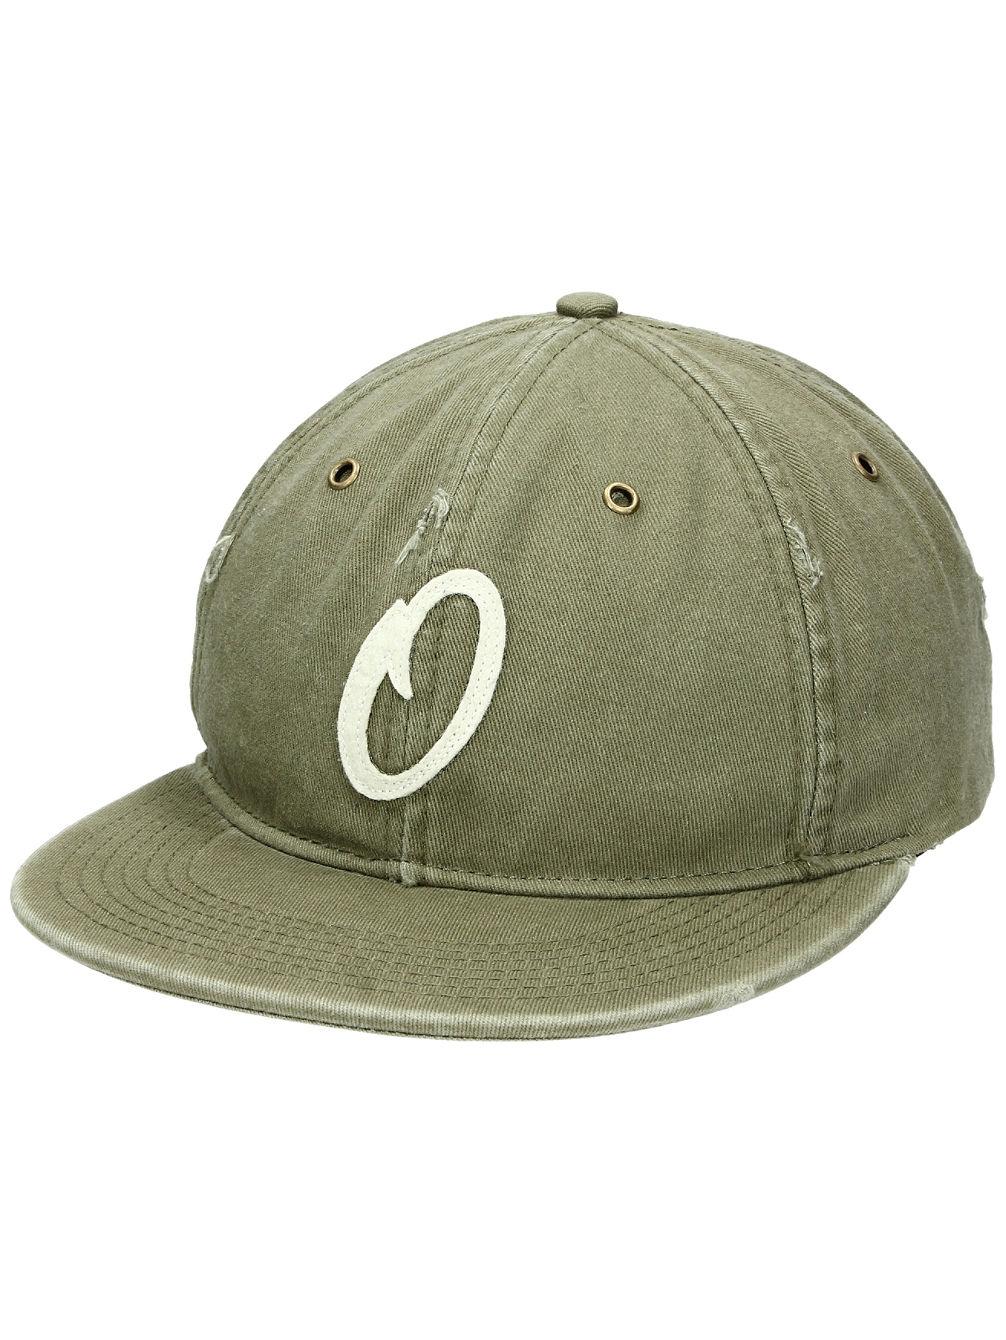 the-official-rojo-o-cap